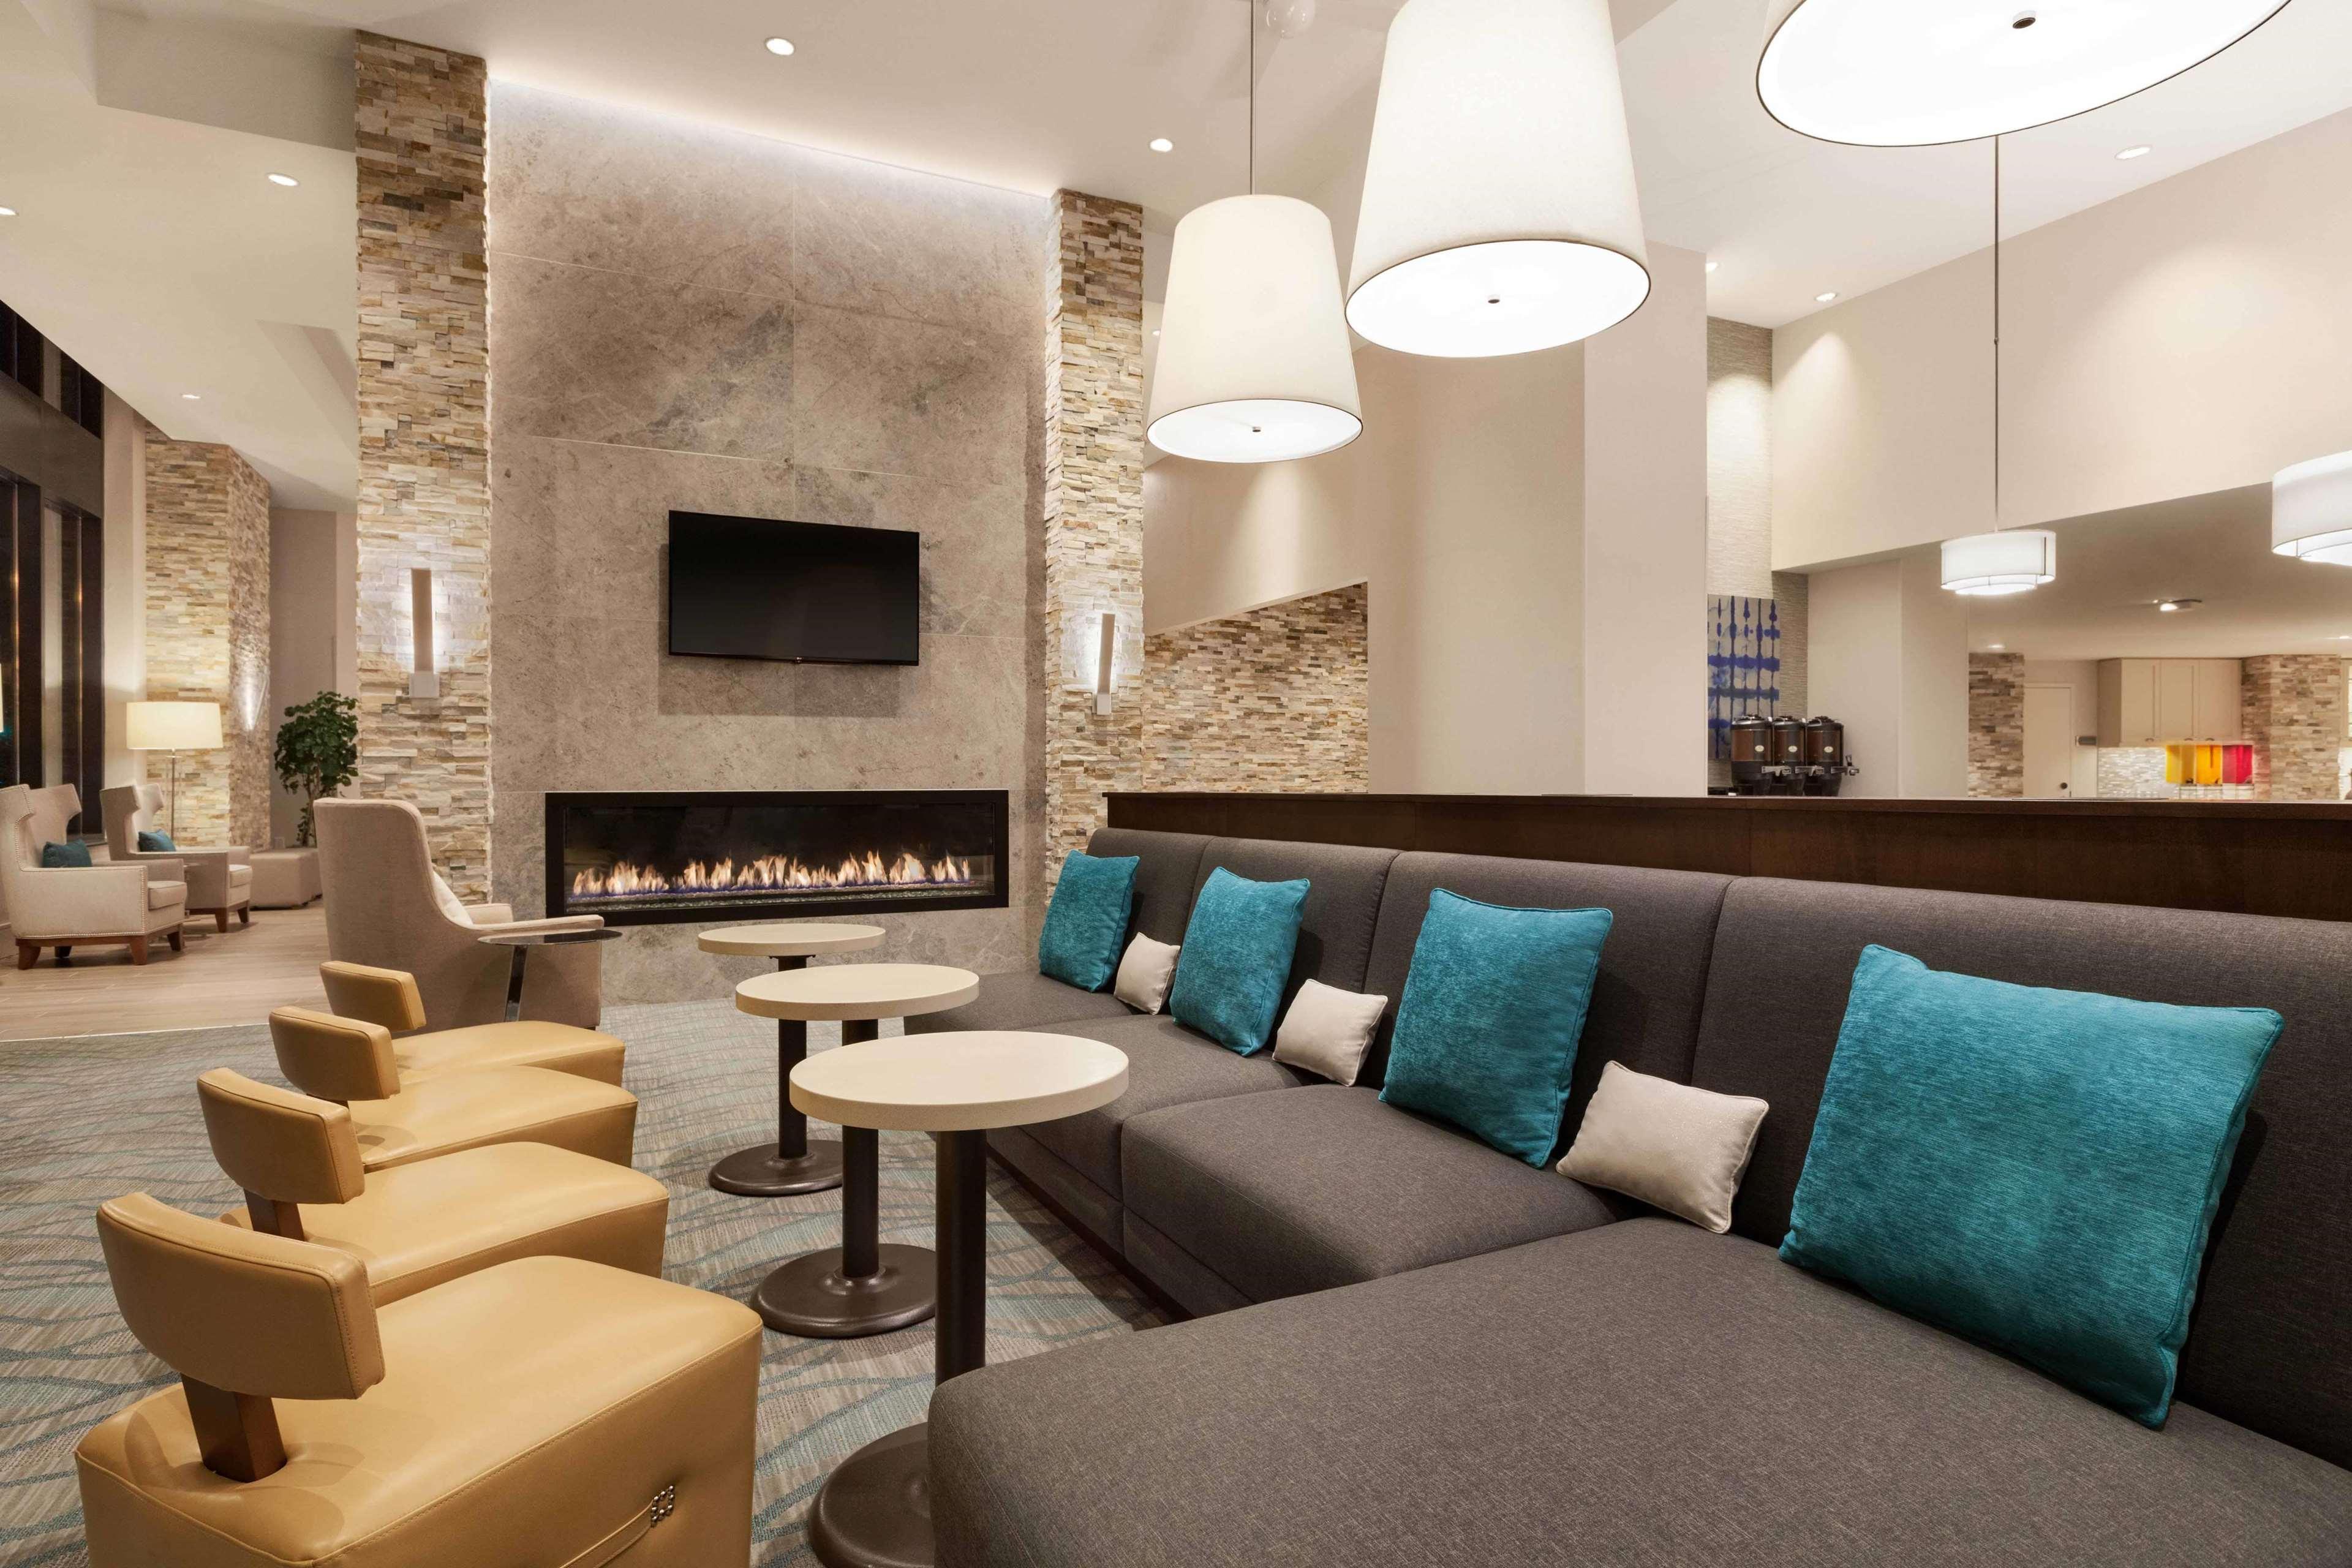 Homewood Suites by Hilton Washington DC Convention Center image 5